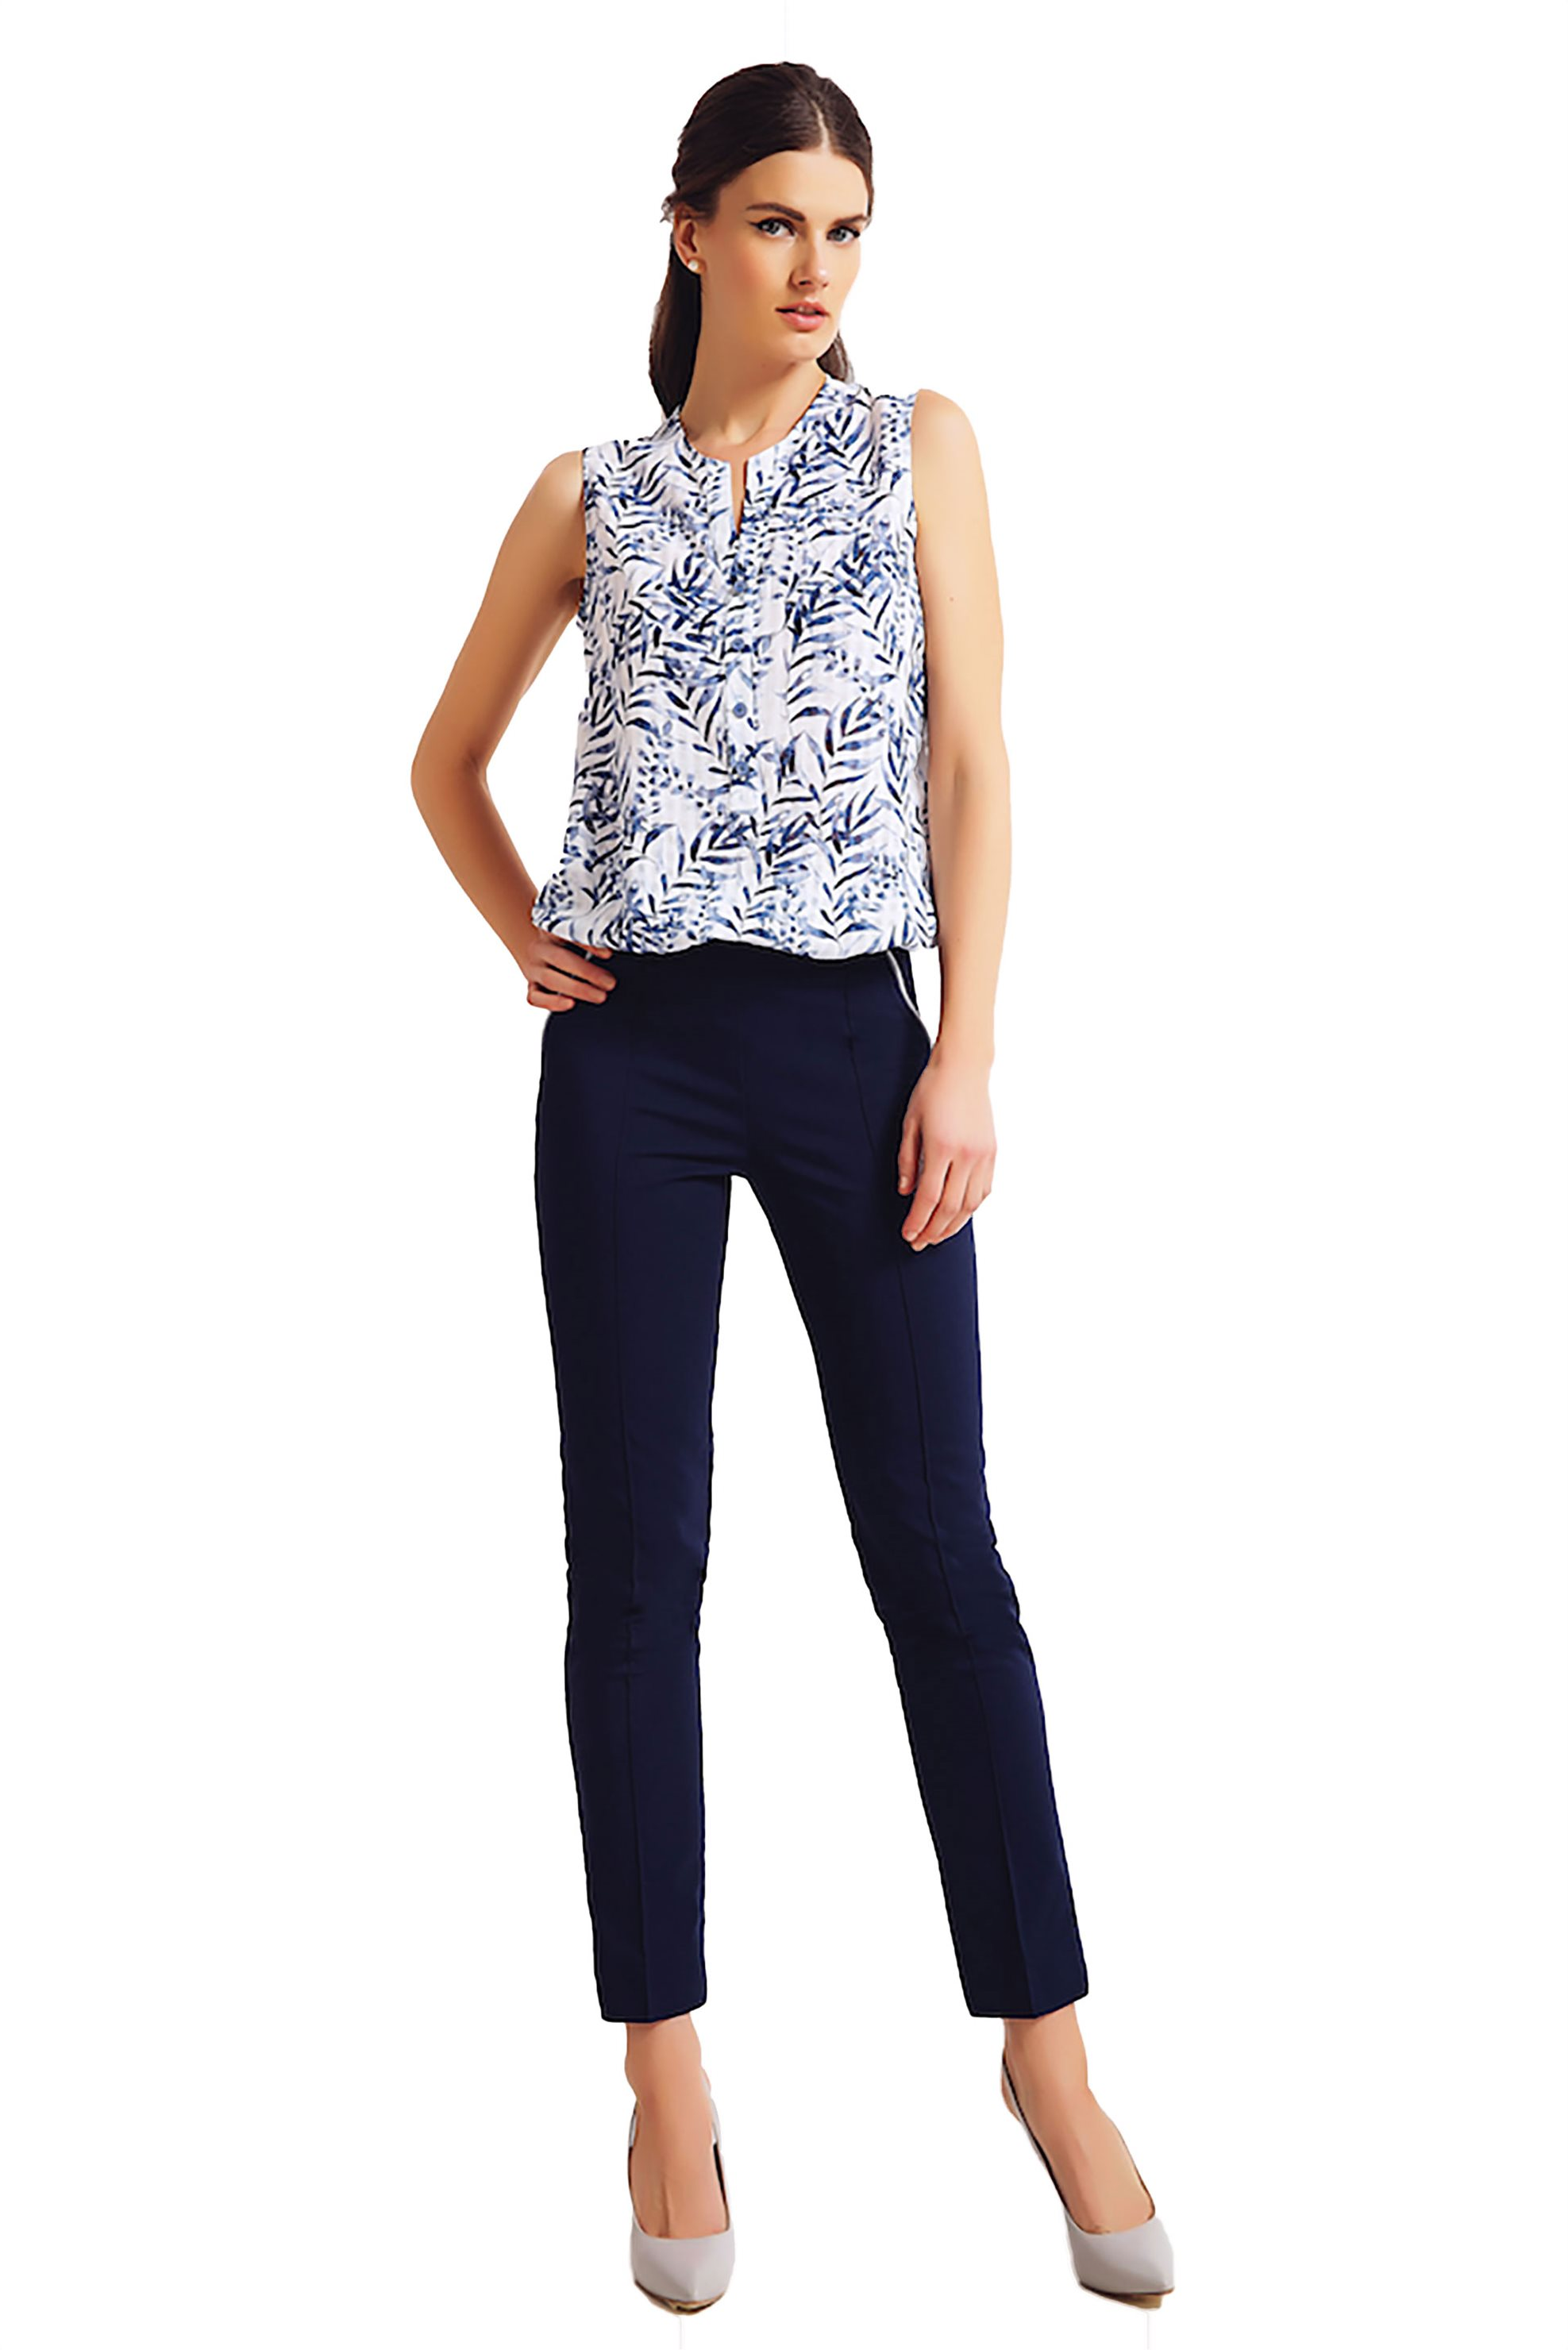 723af98e364e Γυναικεία   Ρούχα   Παντελόνια   Casual   All Day   Λινή παντελόνα ...